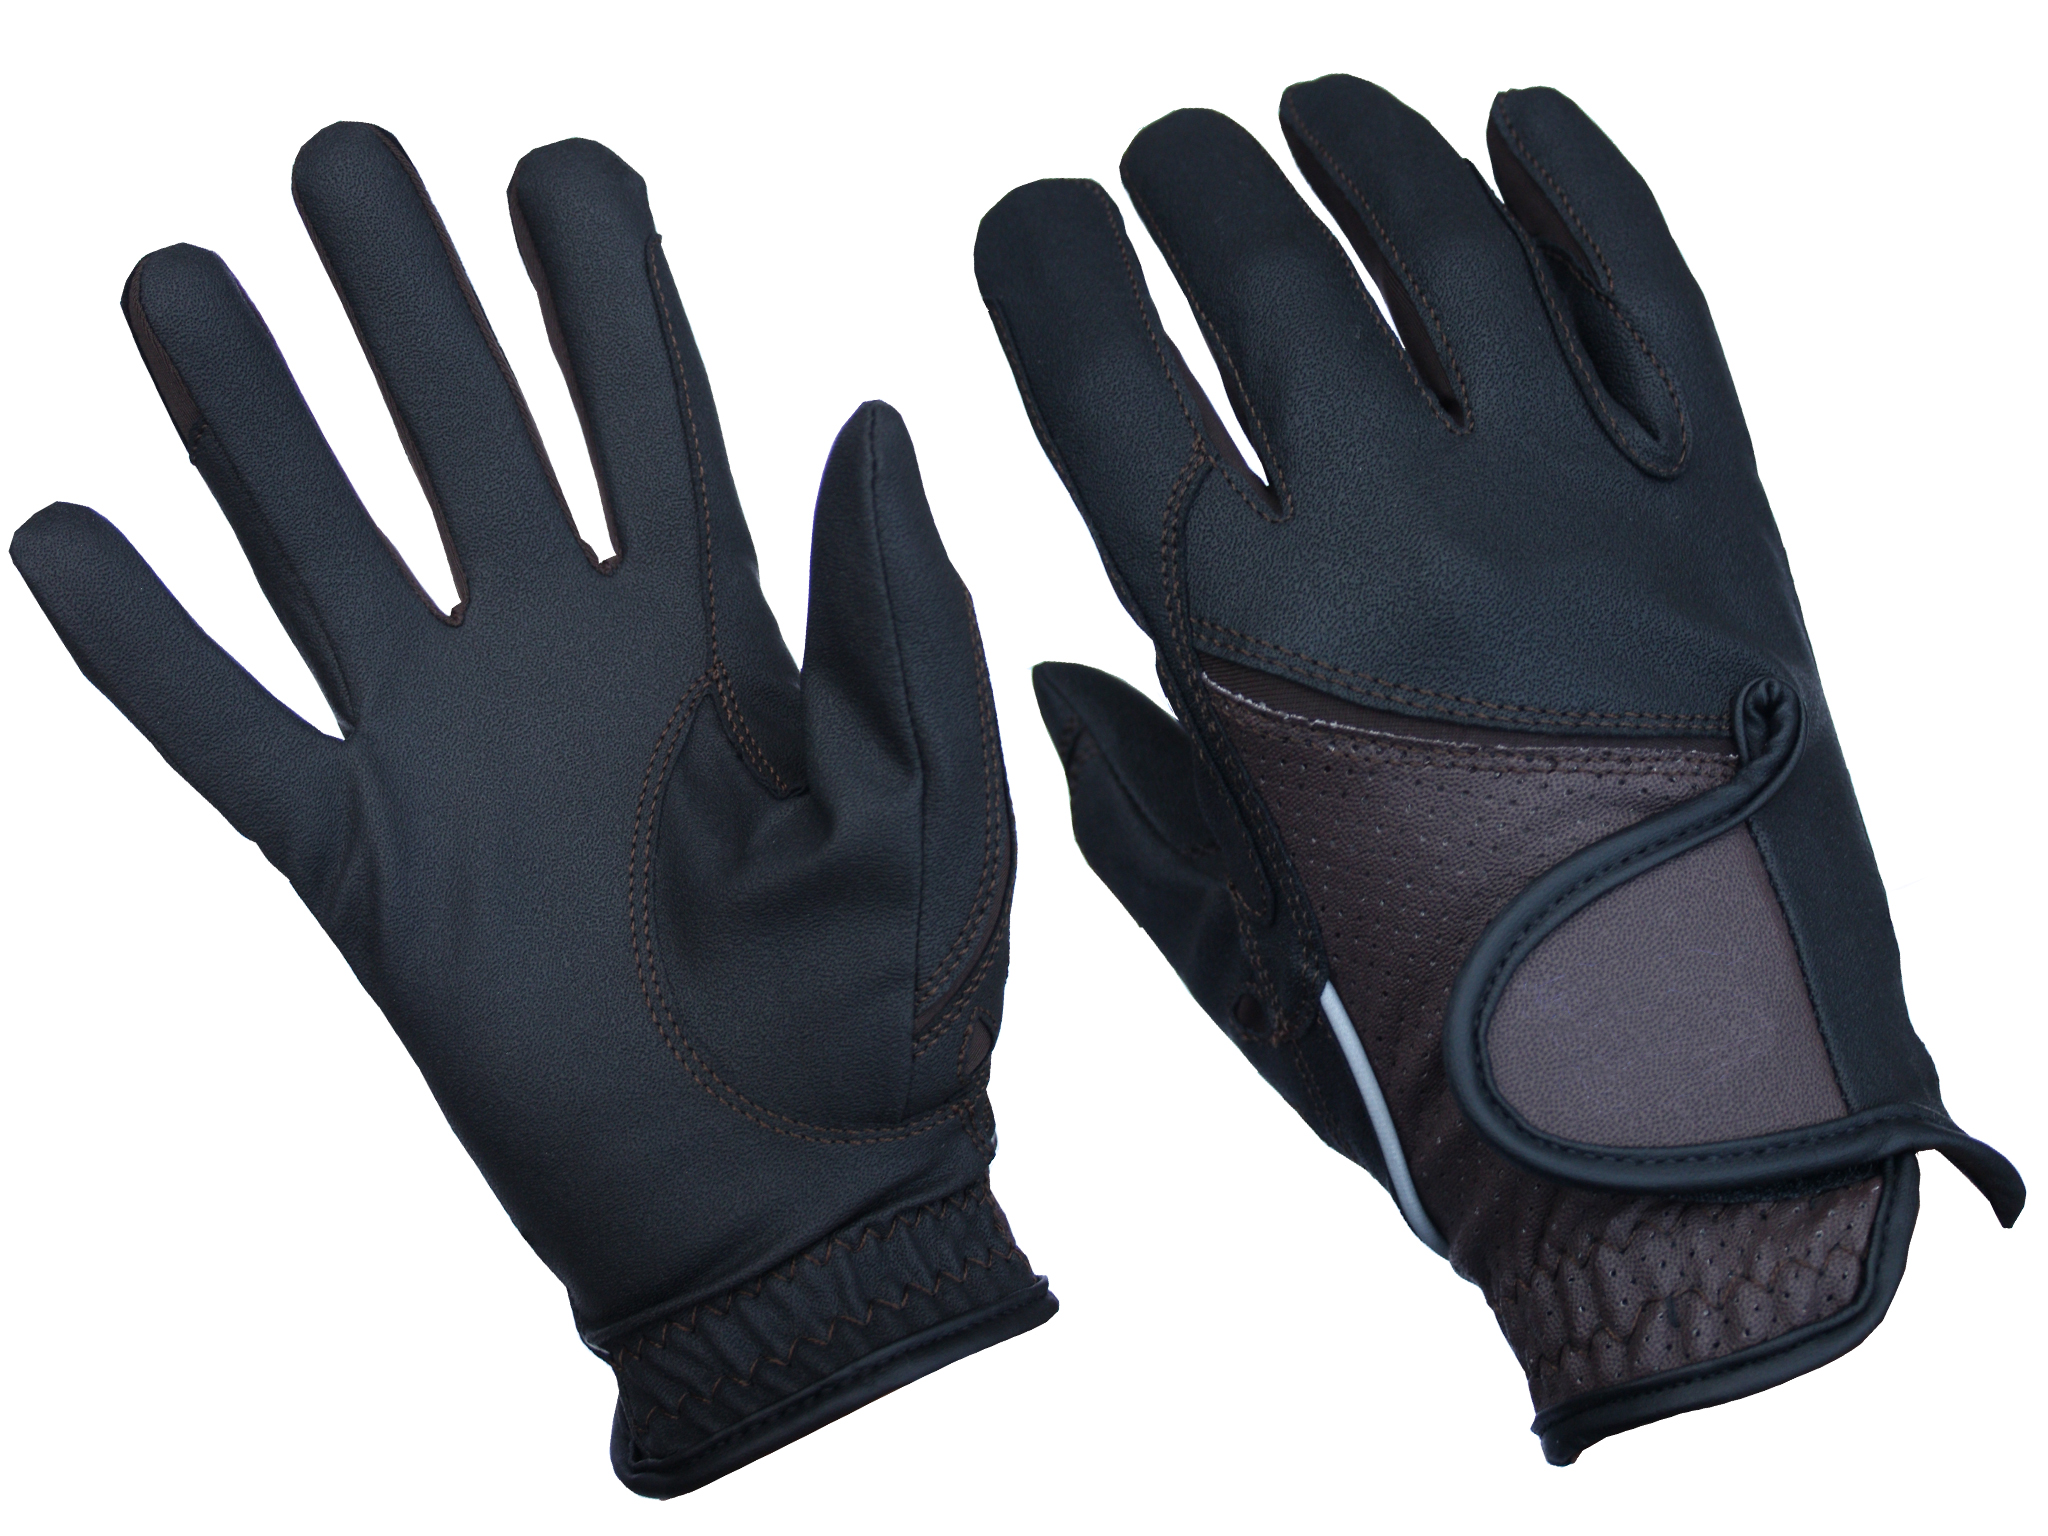 Handschoen Rider Pro HAMILTON bruin zwart S M L